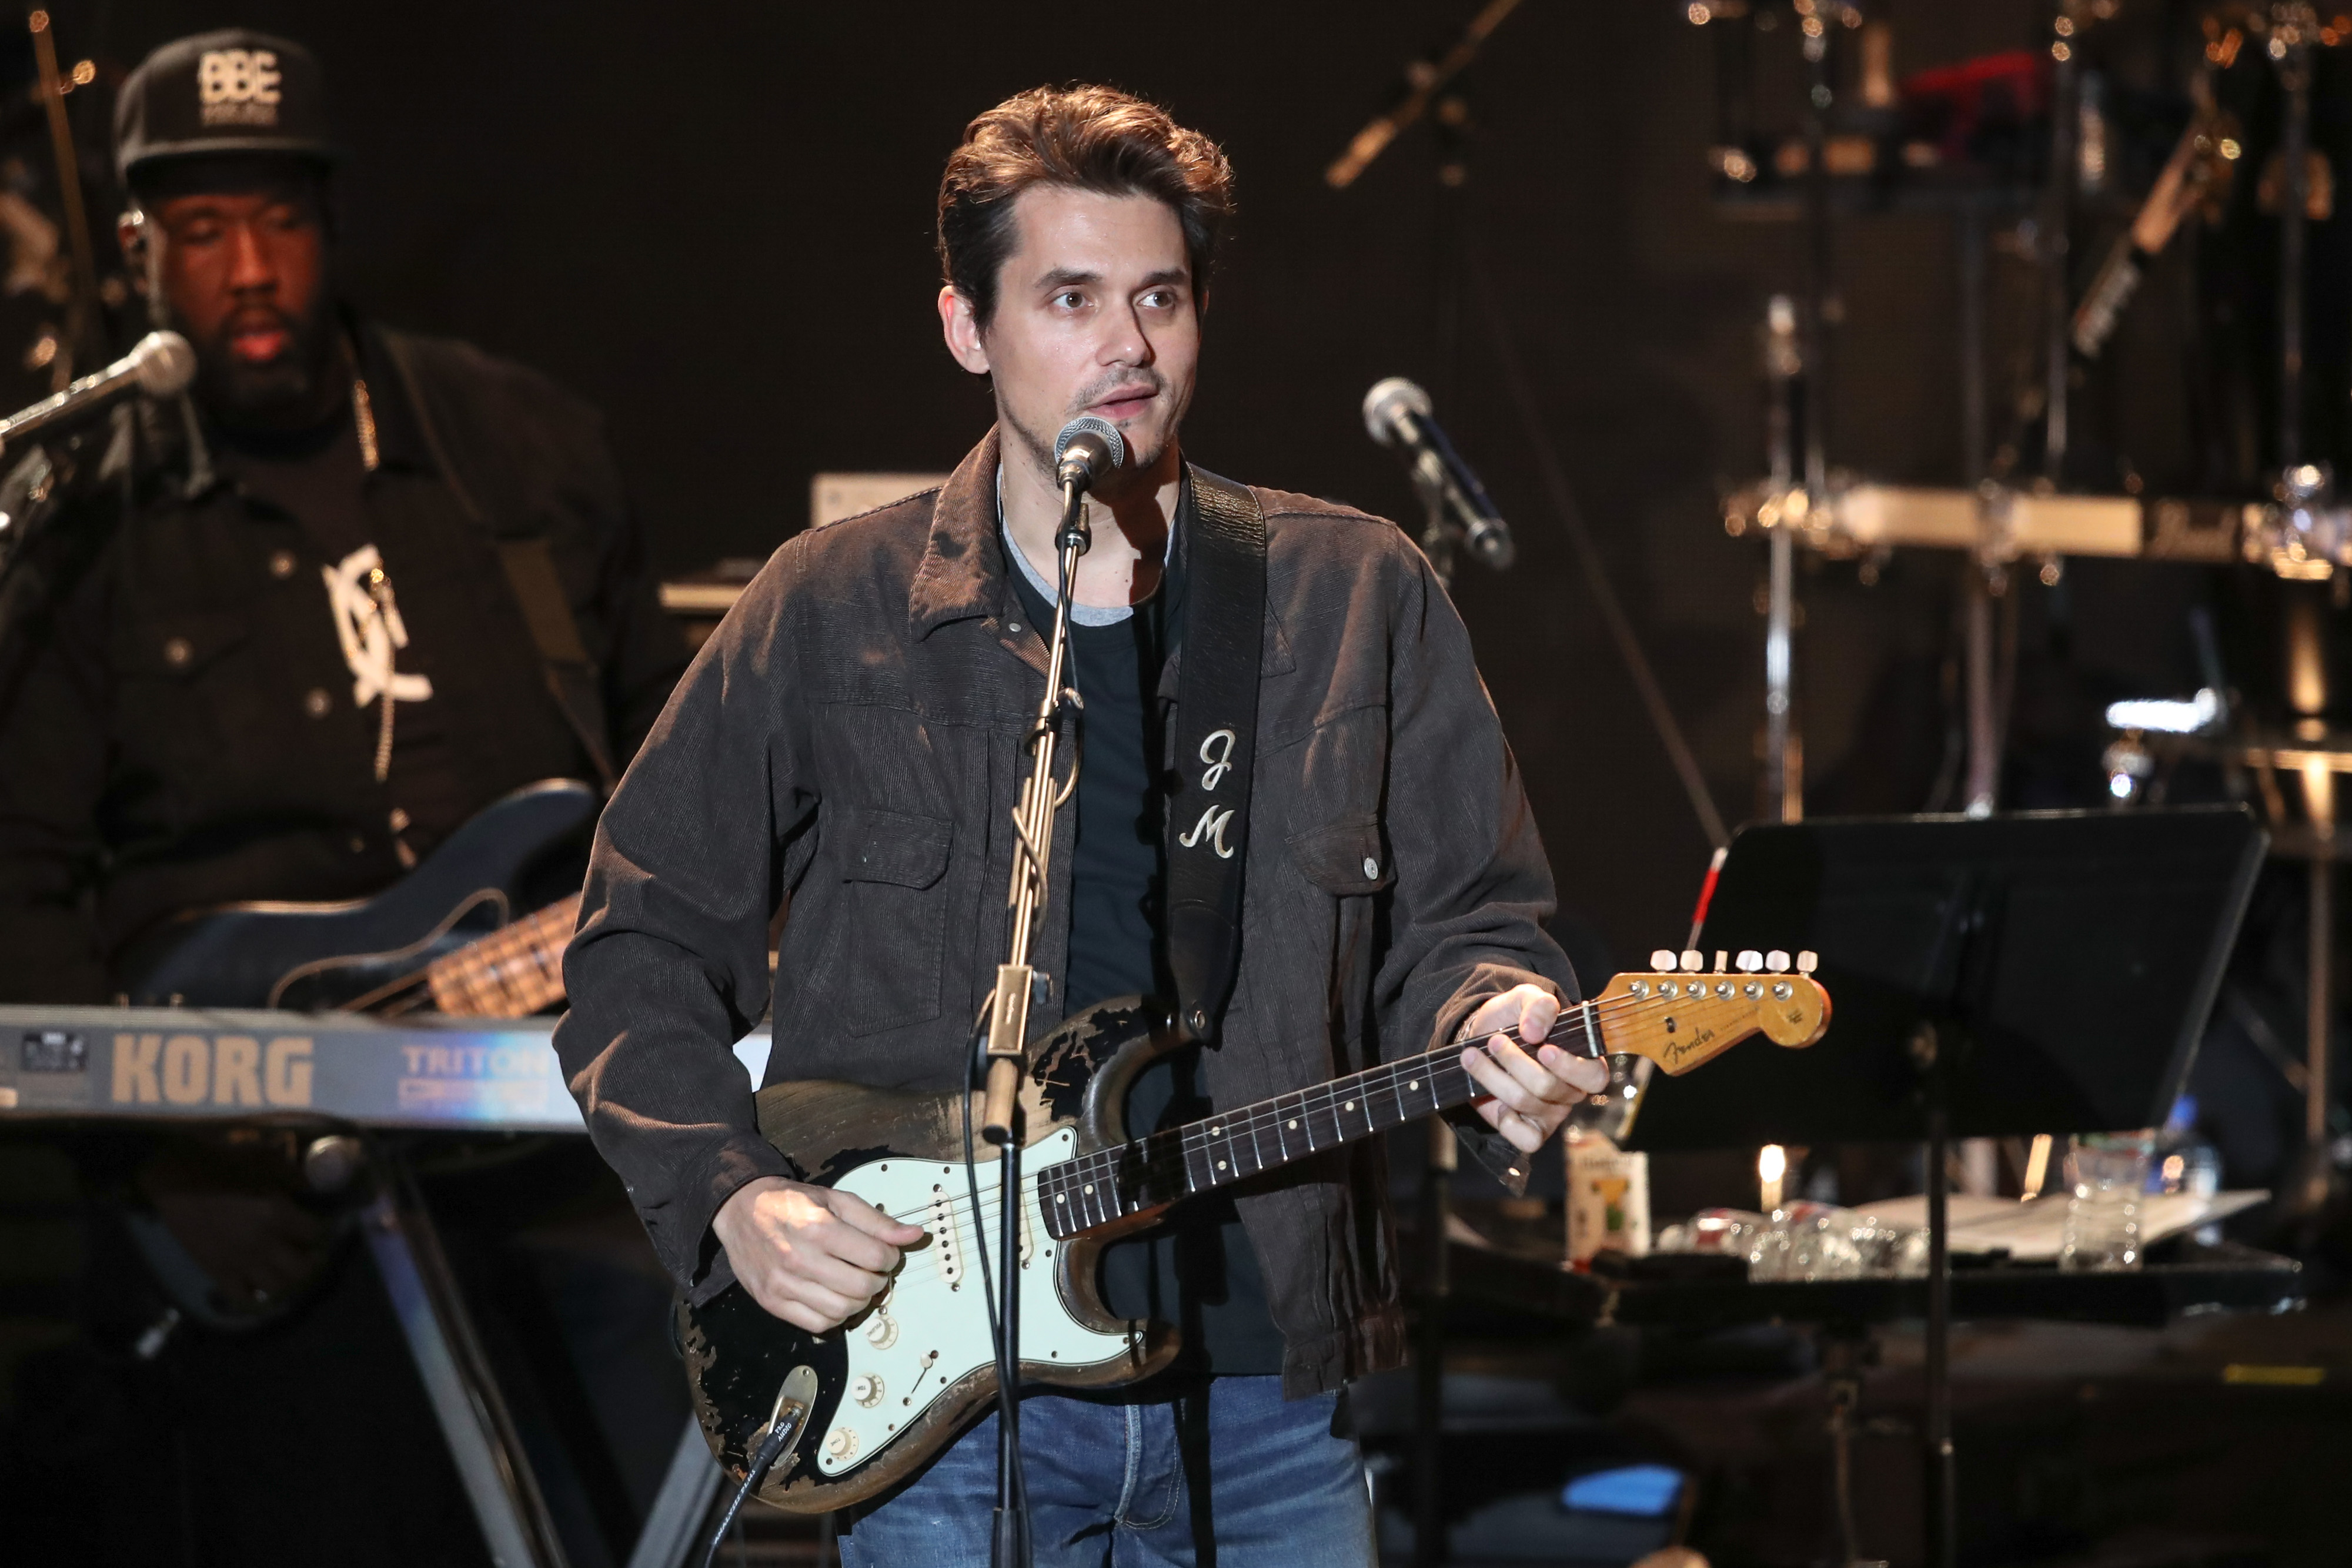 John Mayer Summer Tour 2020 John Mayer Details Solo U.S. Summer Tour – Rolling Stone